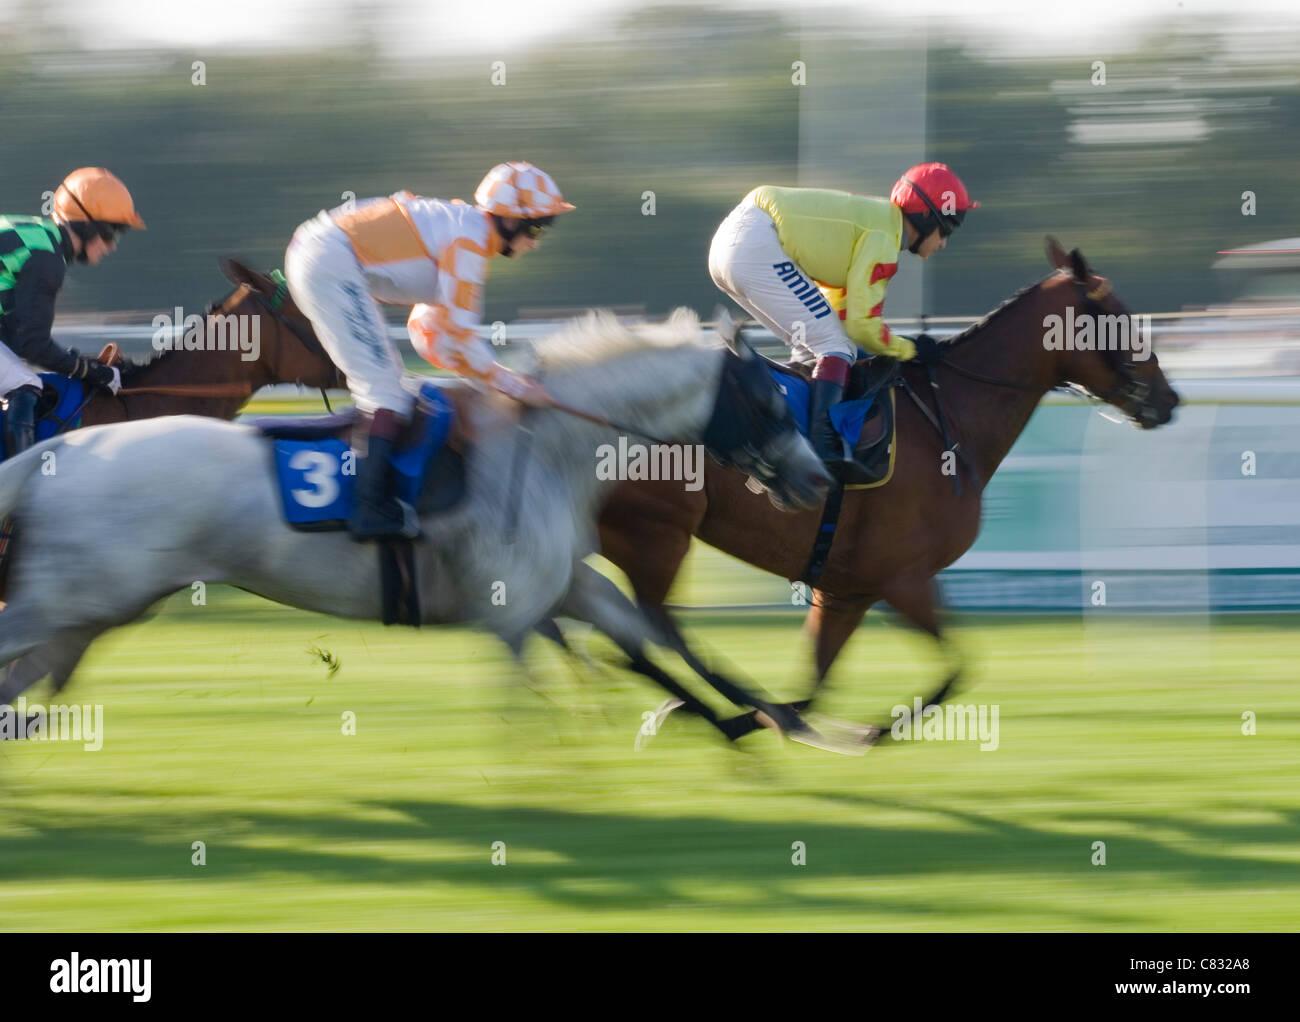 Corse di cavalli Gruppo di cavalli racing UK Immagini Stock